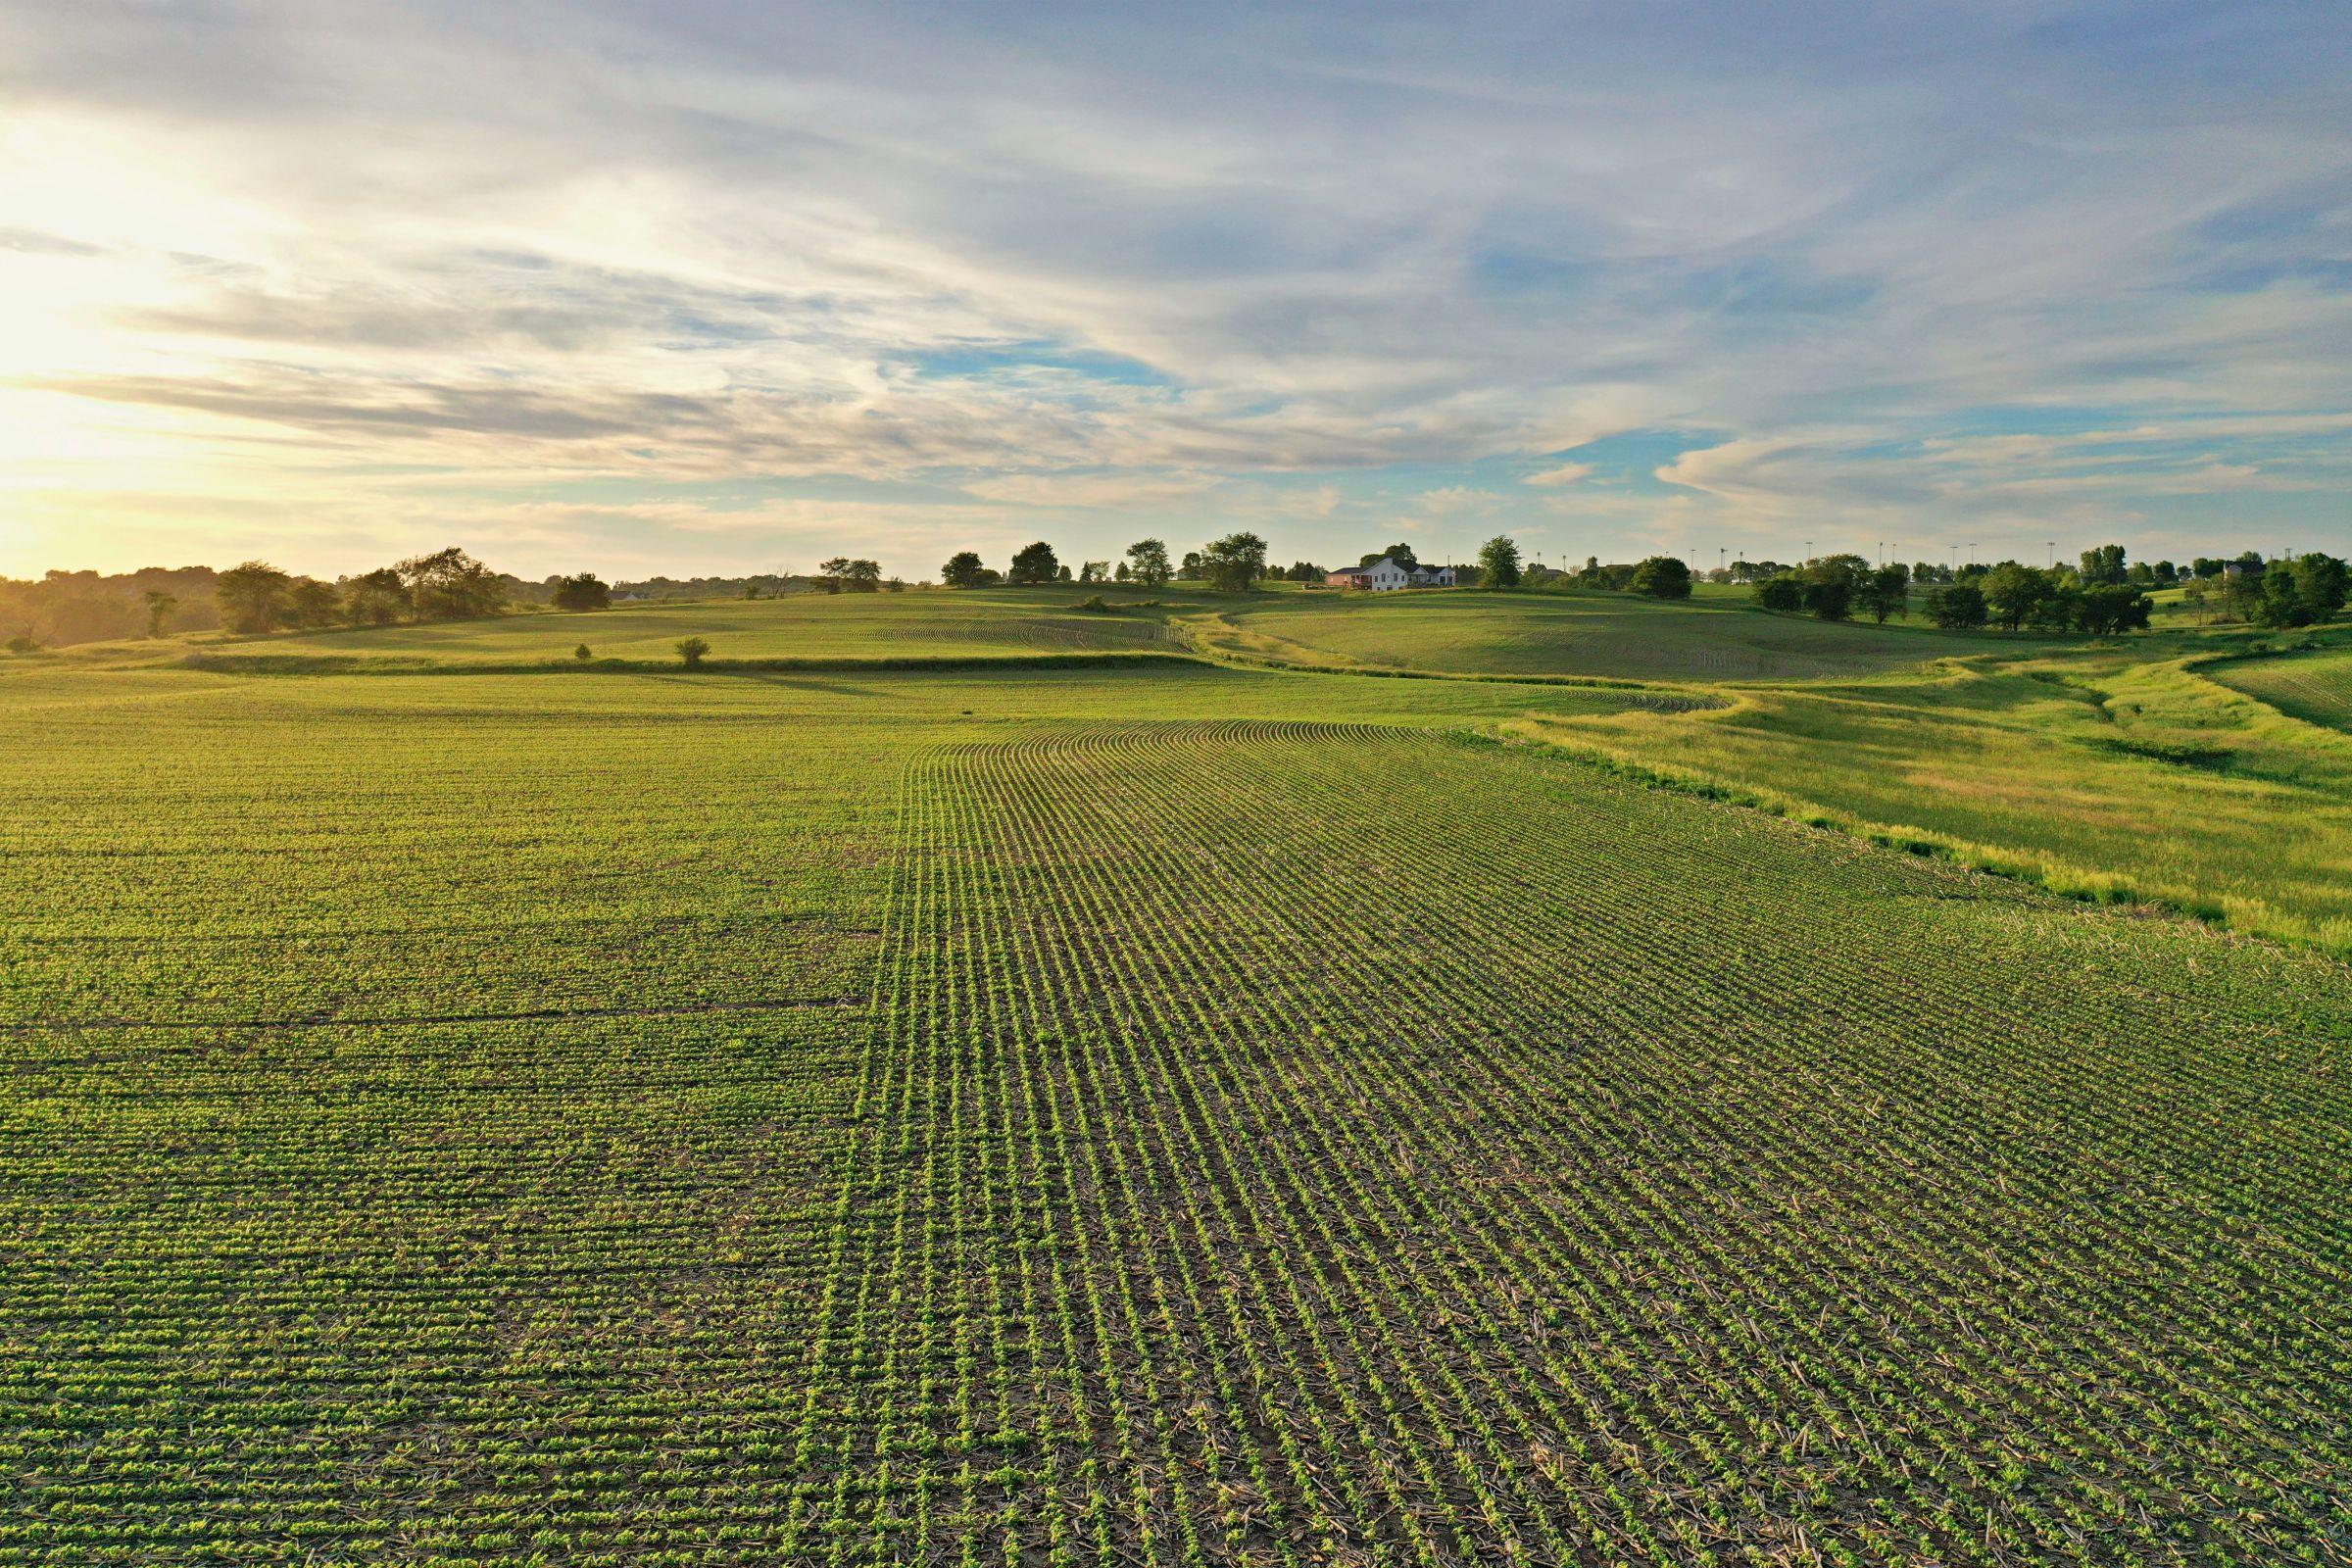 land-warren-county-iowa-20-acres-listing-number-15426-3-2021-03-24-185844.JPG